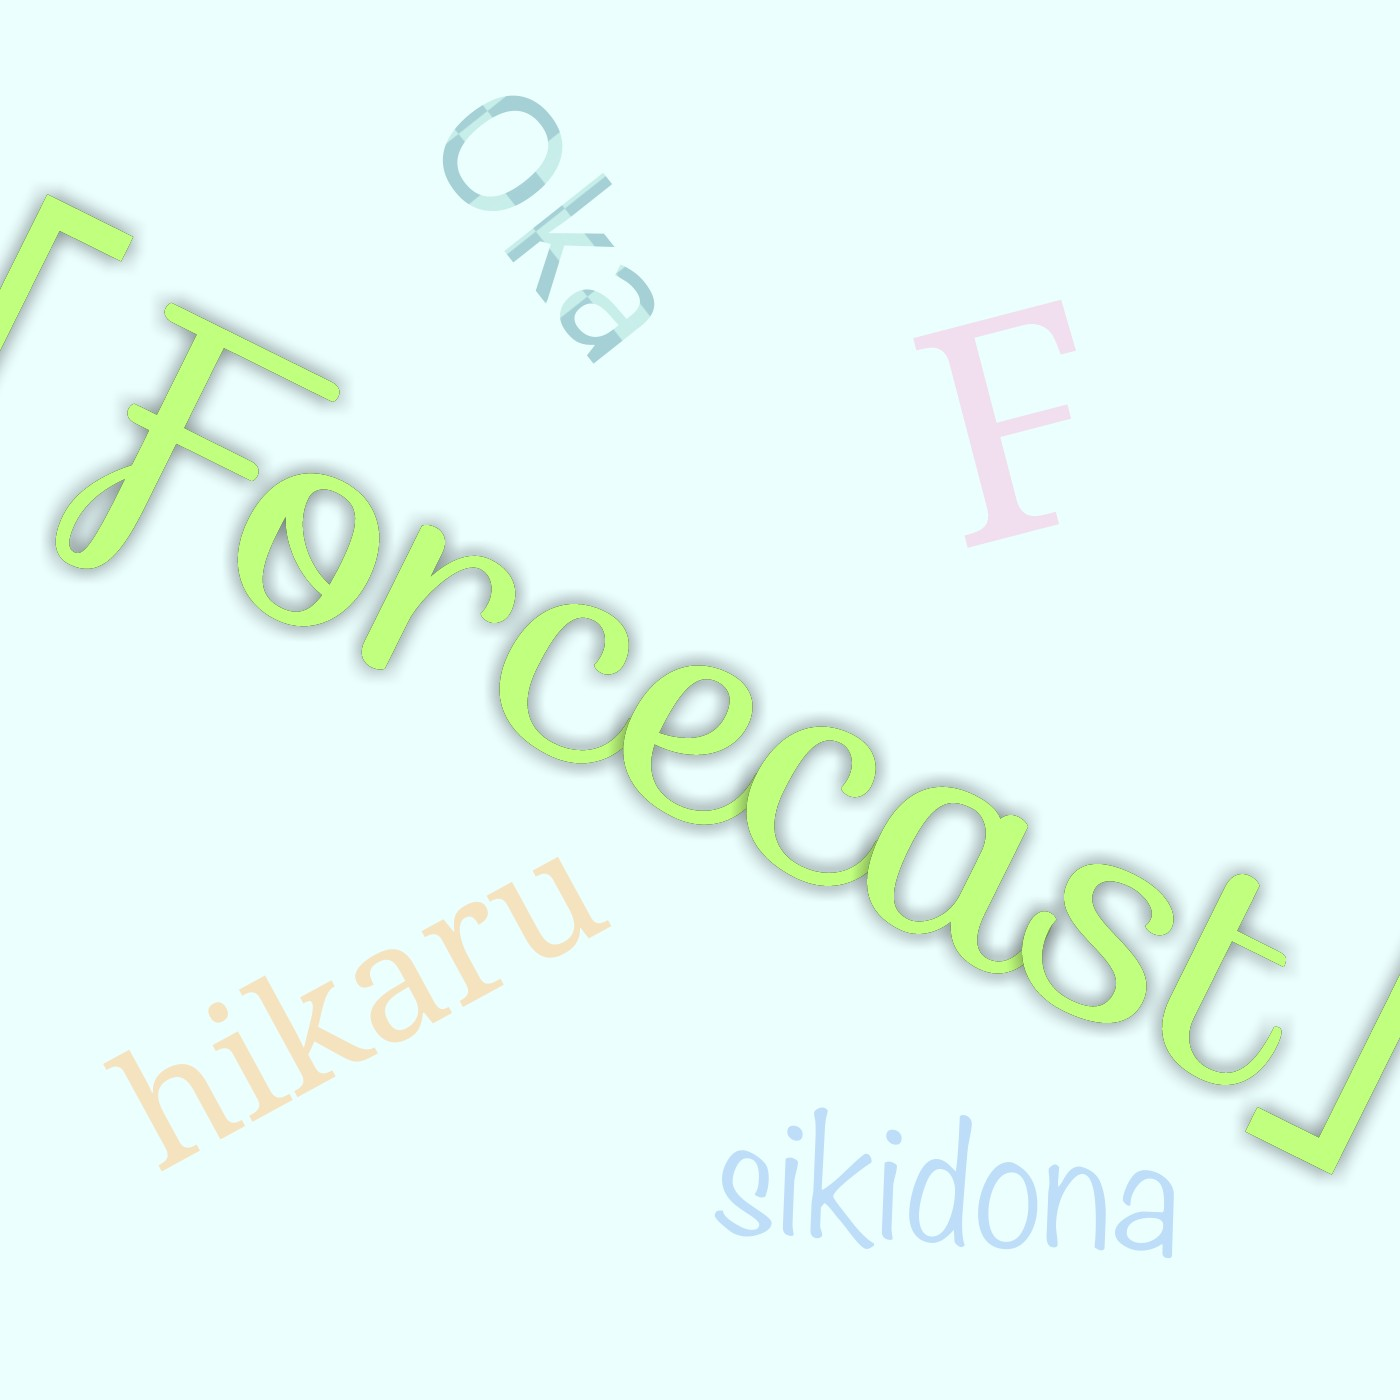 「Forcecast」  |  しきどなのDブログ!